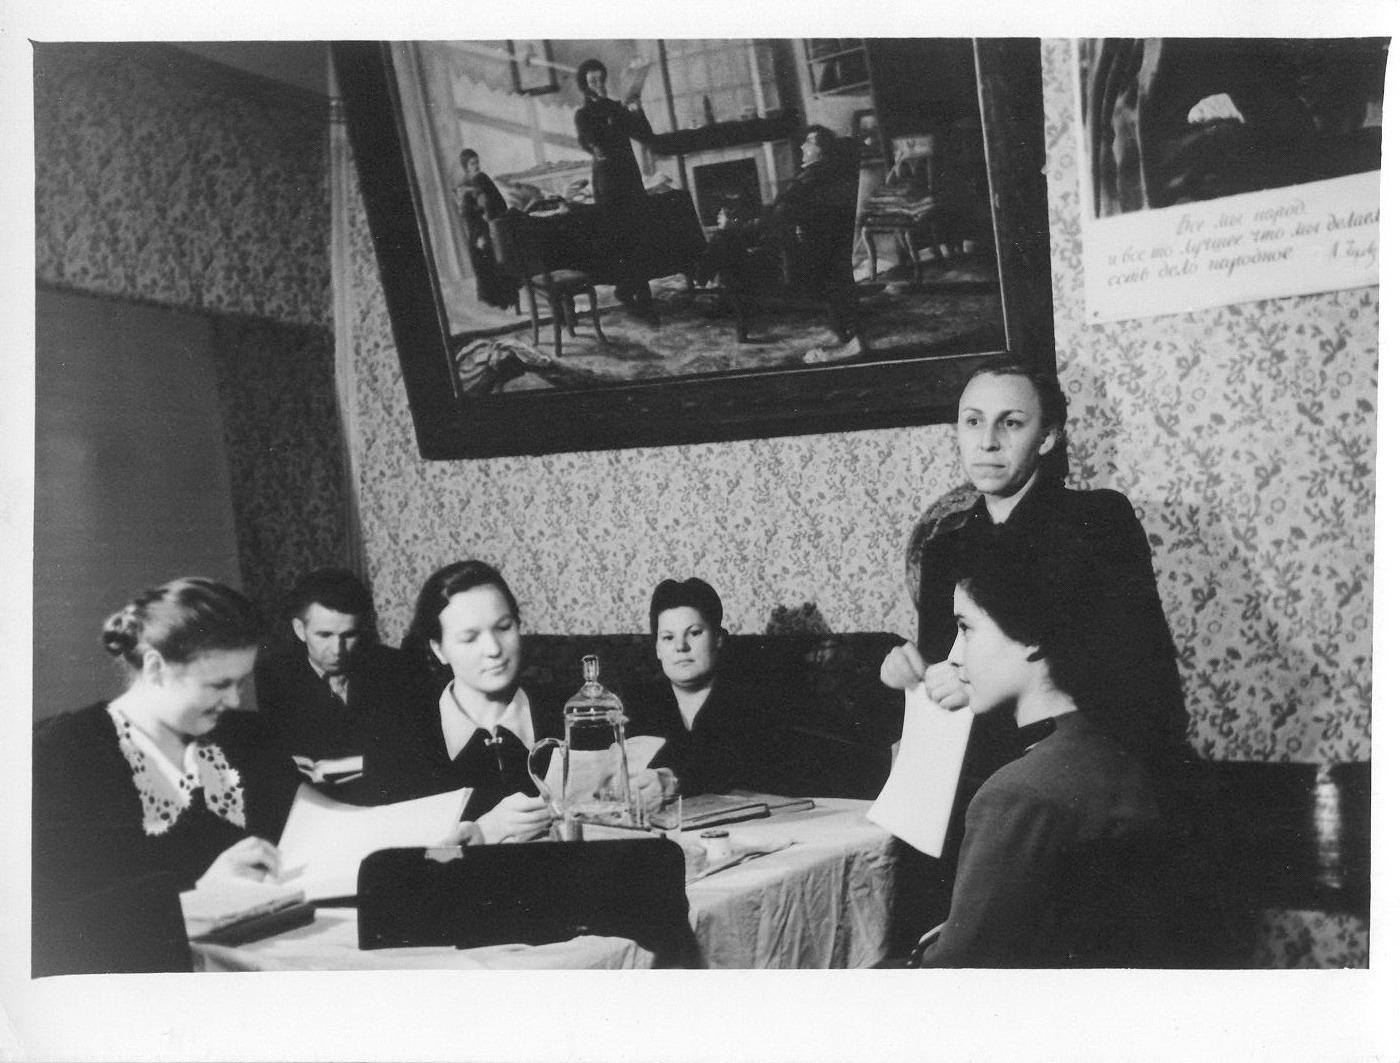 Школа в Загорске. 1955-1956 годы